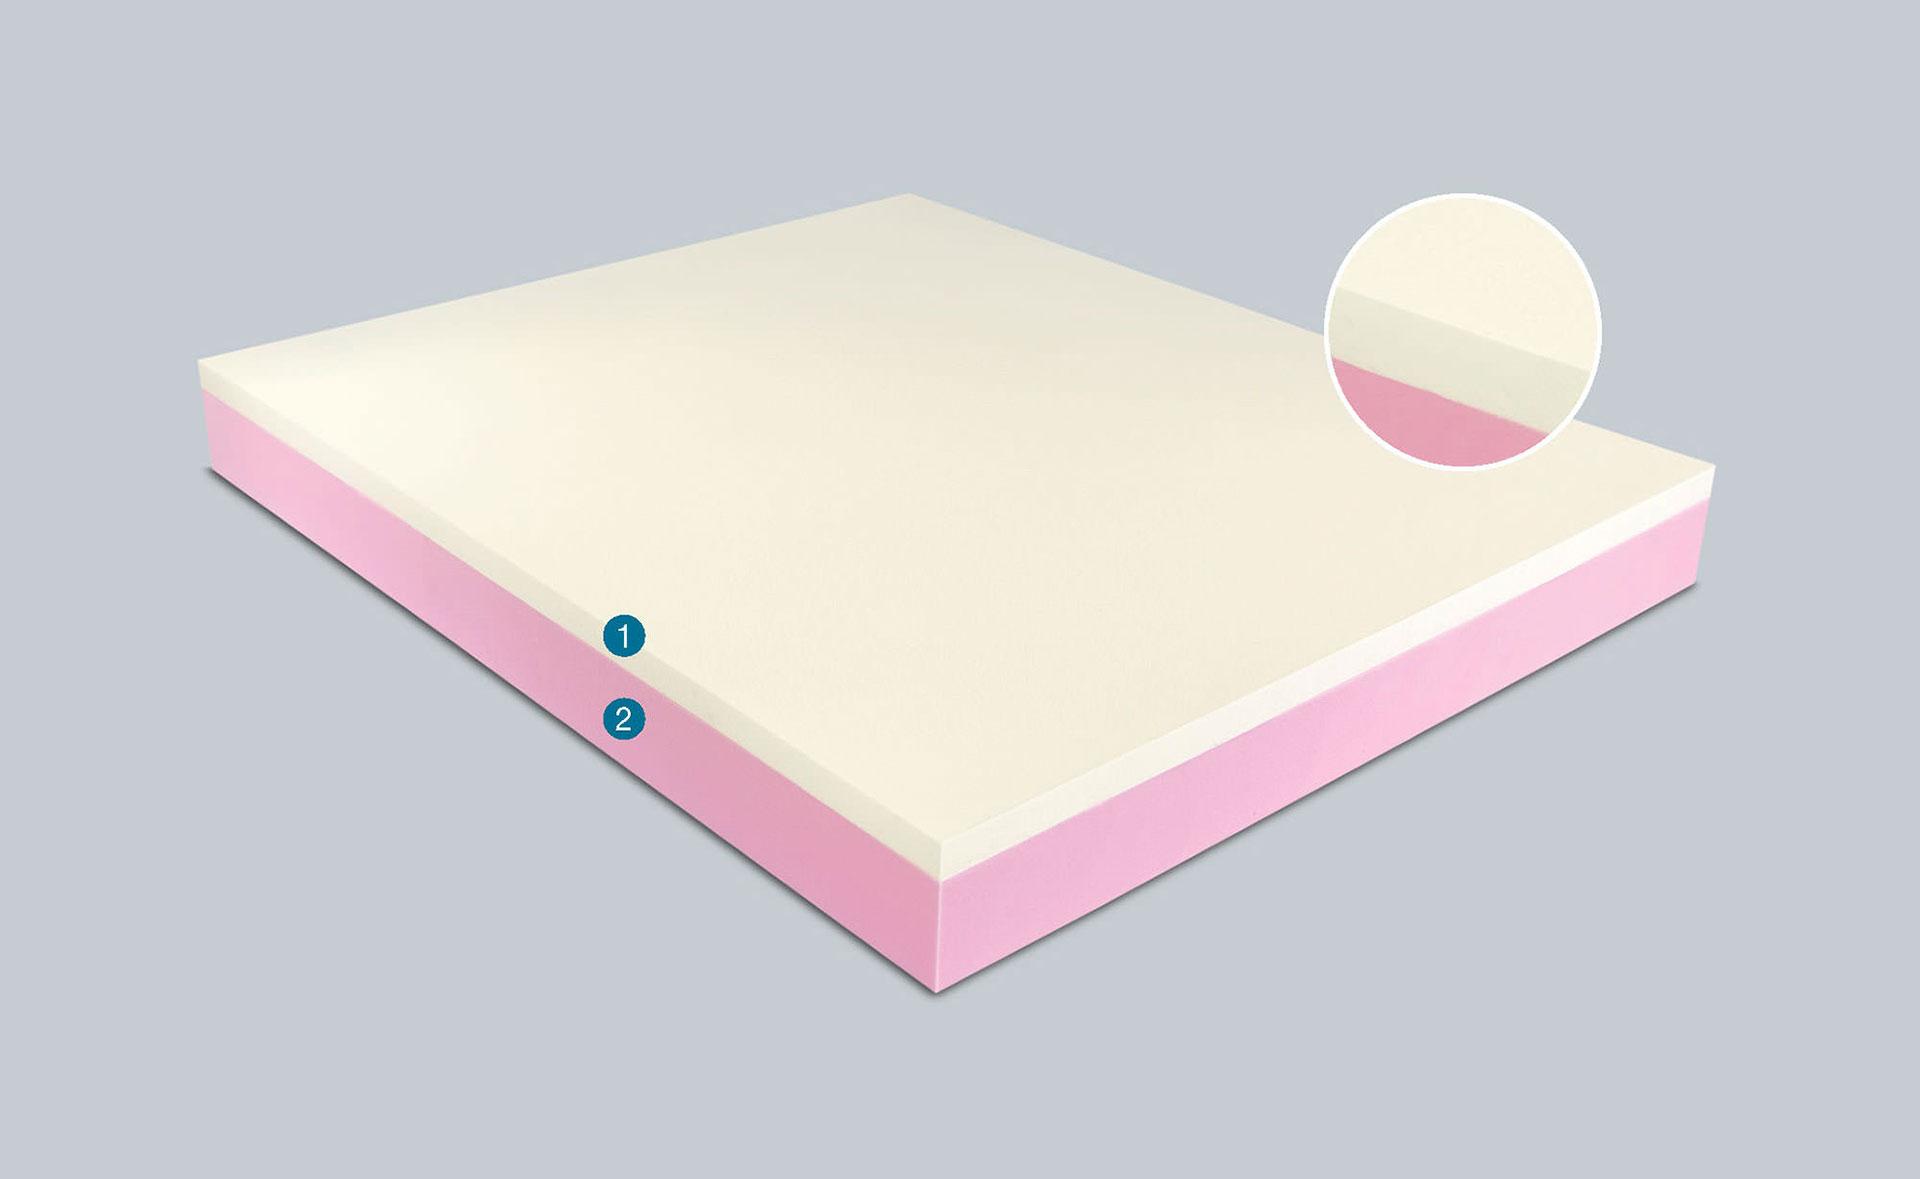 Polifoam Memory 5 - Materasso Memory Foam - Poliuretano